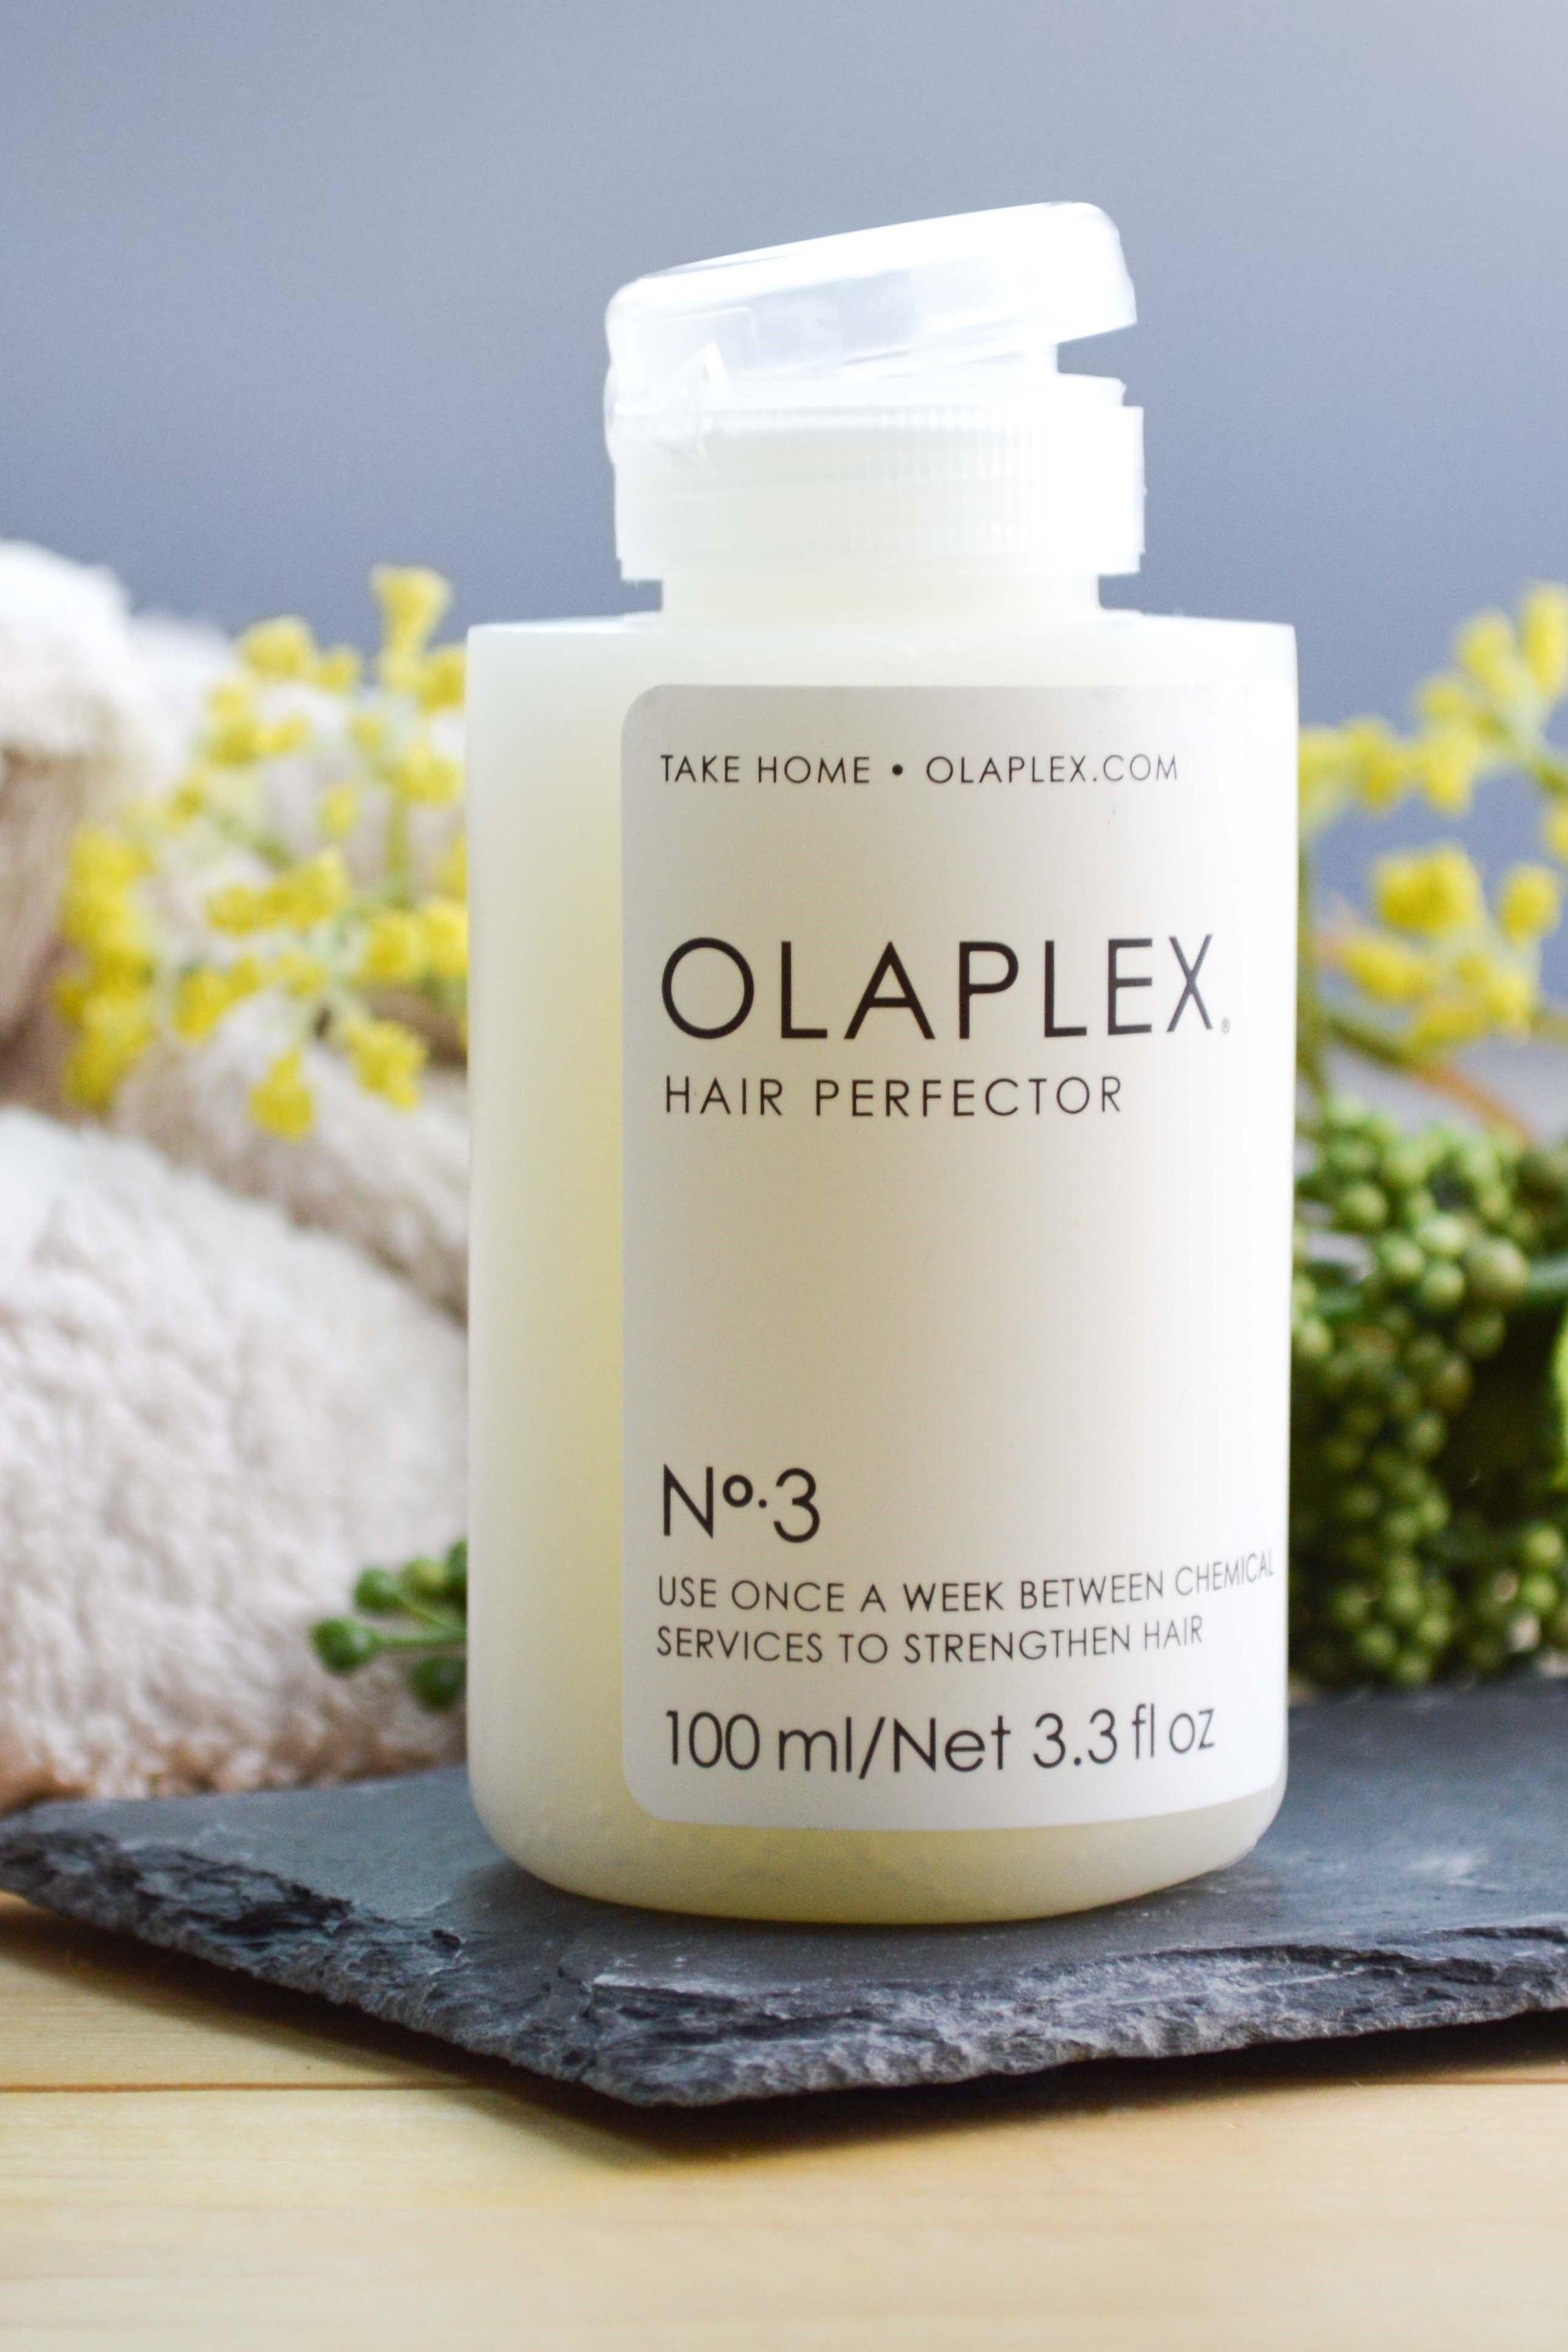 Olaplex - Hair Perfector | parfumdreams in 2020 | Haare